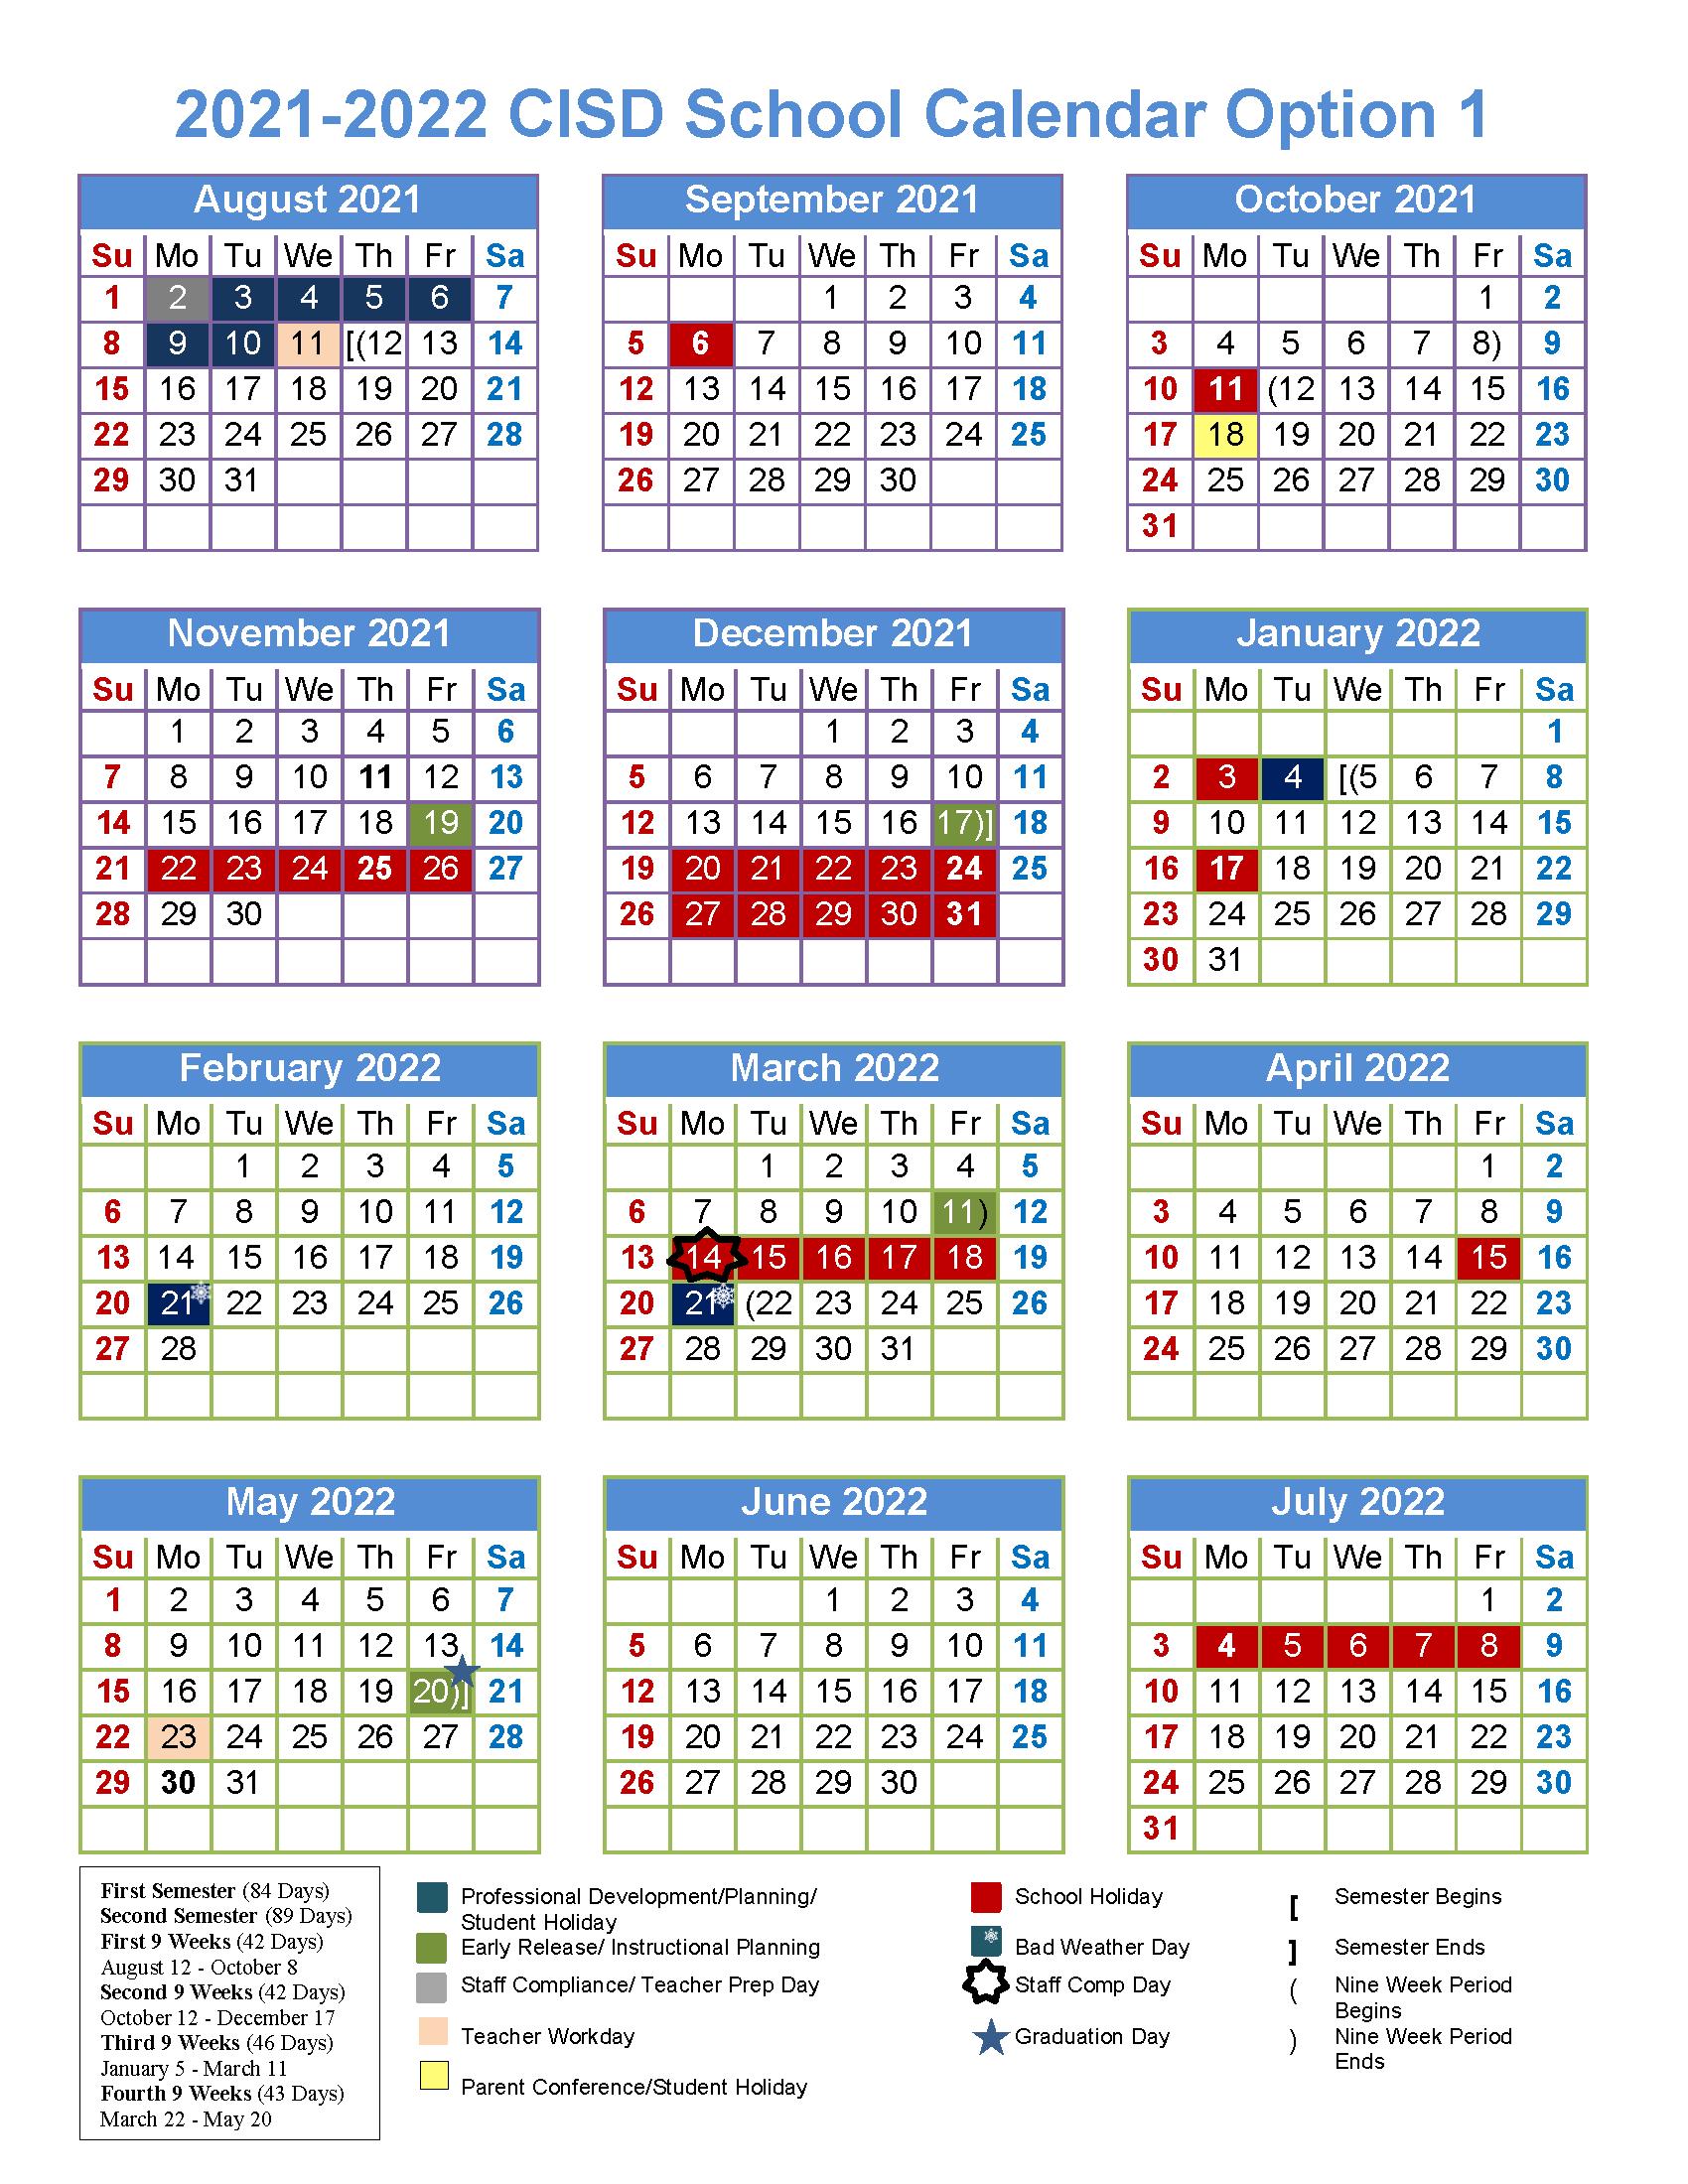 2021 2022 Cisd School Calendar Options Survey Throughout Billings School District 2 Calendar For 2021 2022